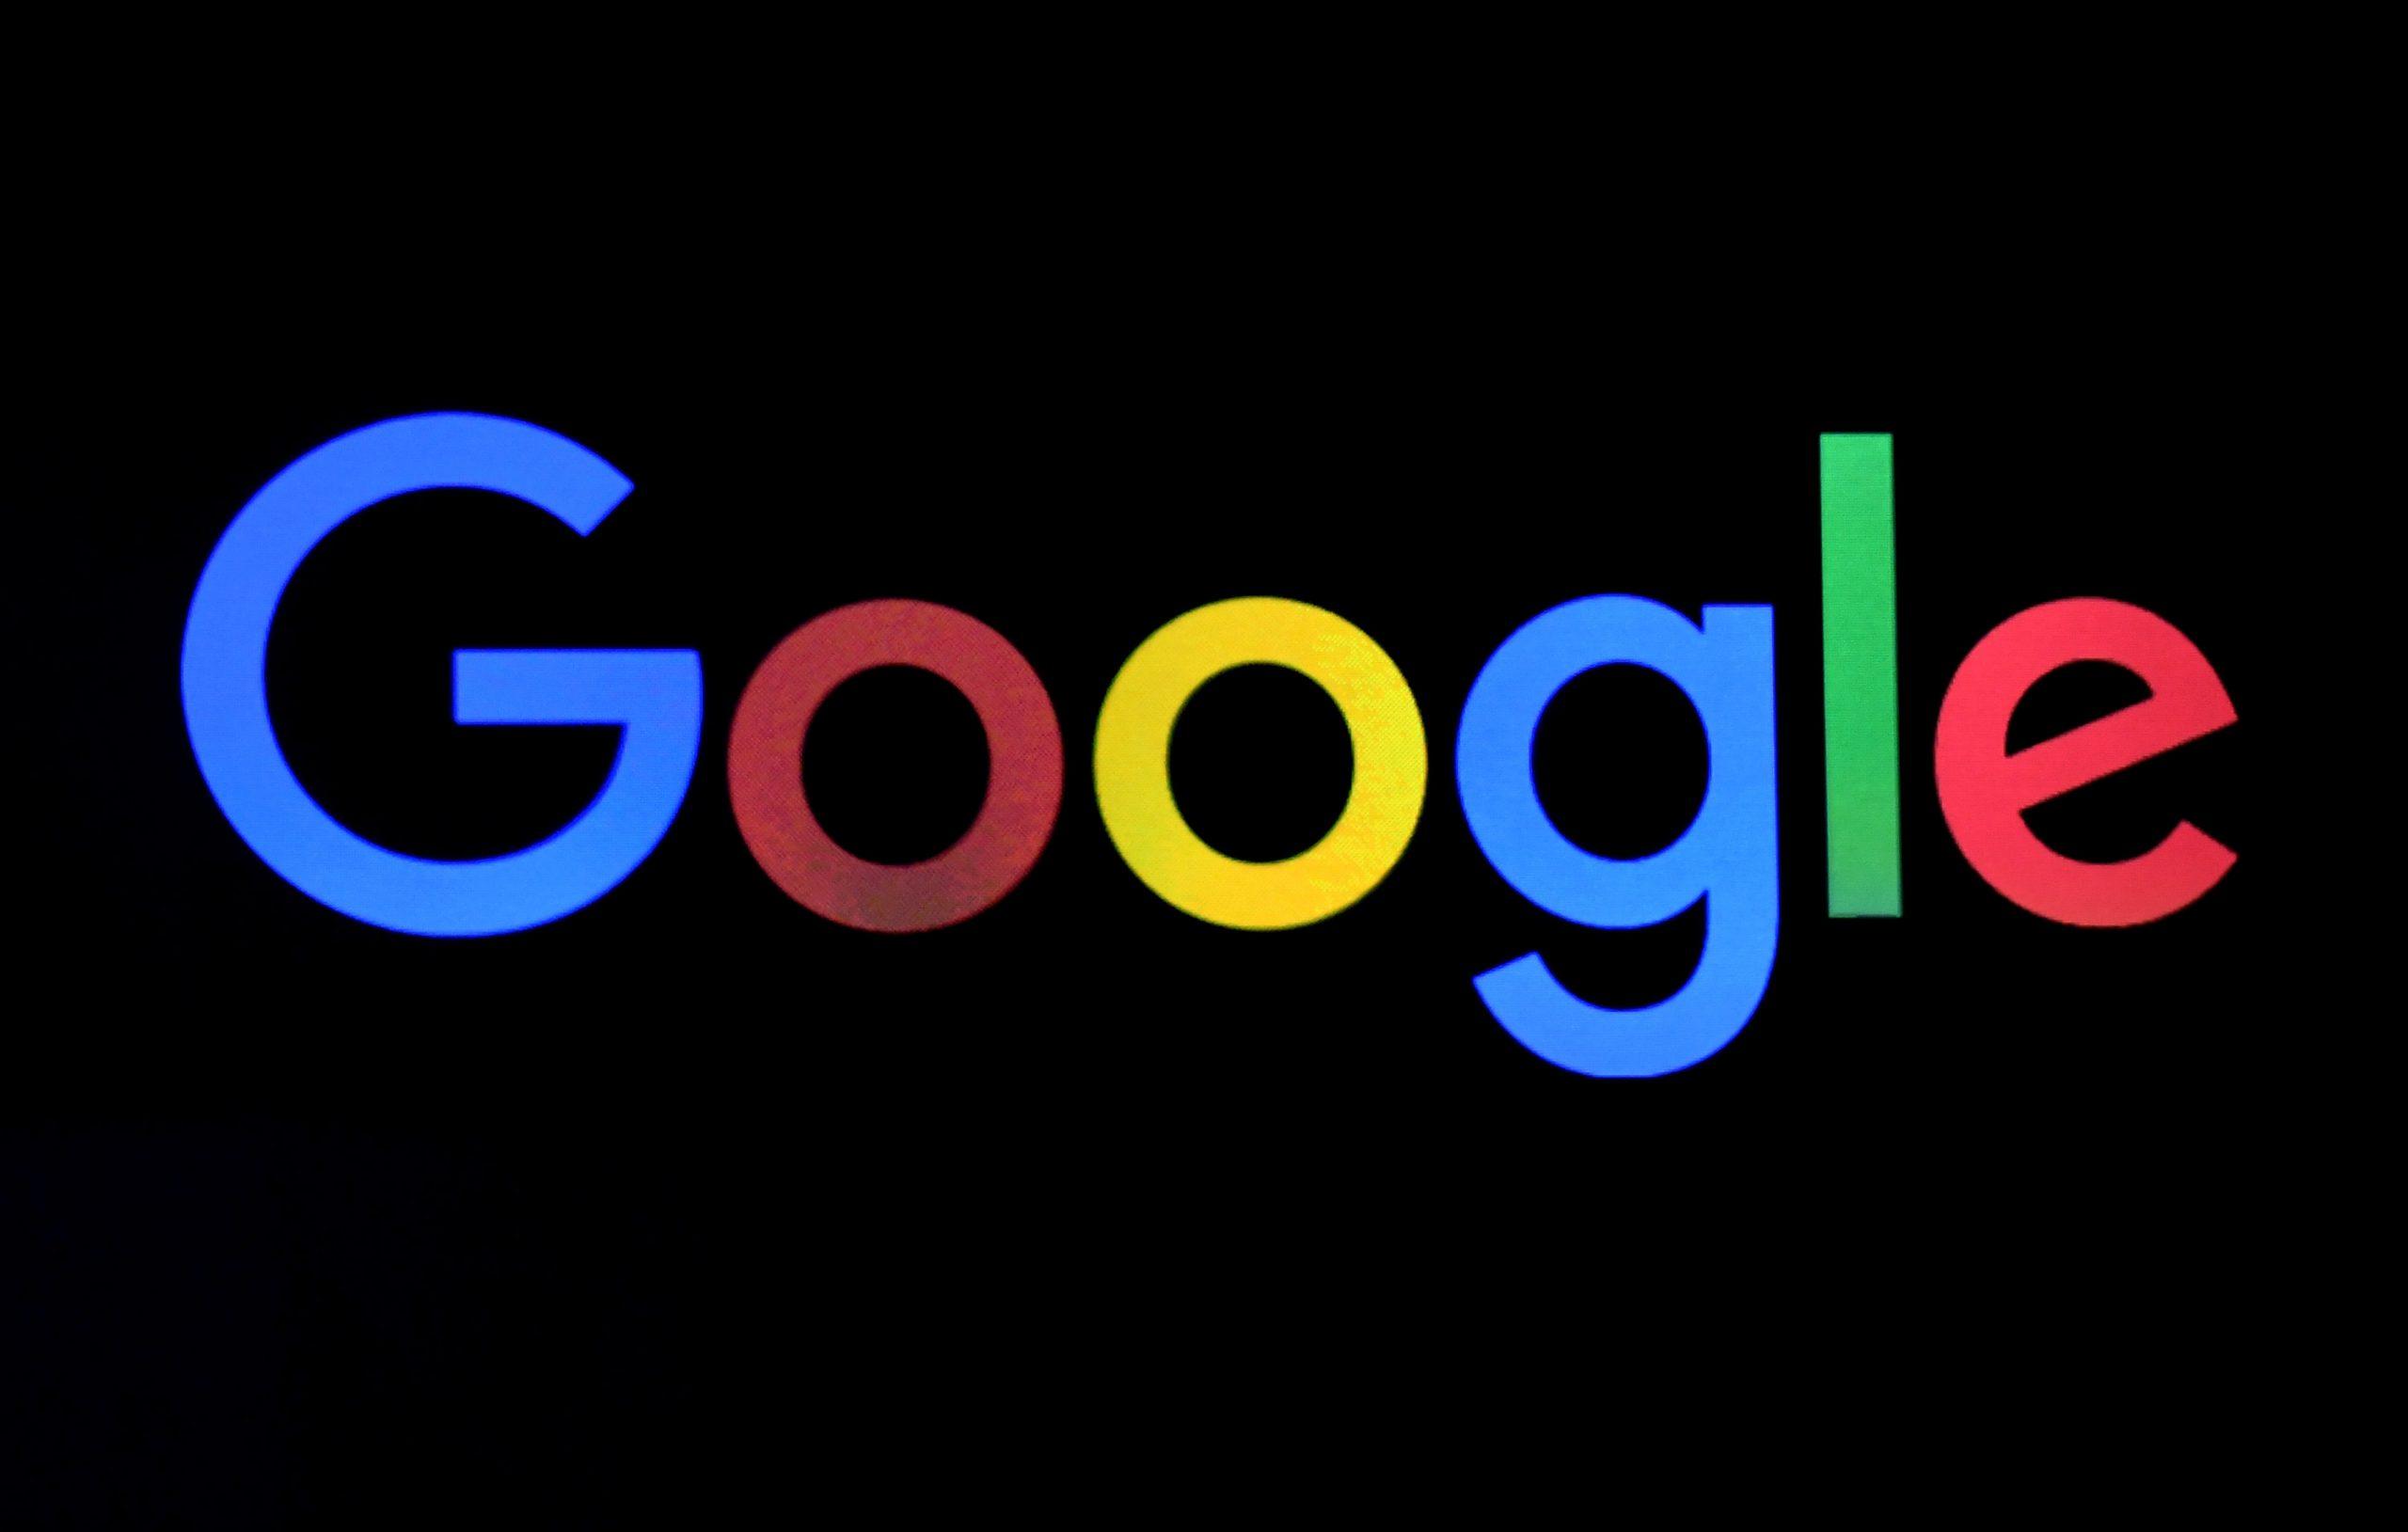 Google Earth: Γυρίστε το χρόνο πίσω με τη νέα υπηρεσία του Google Earth [pic,vid]